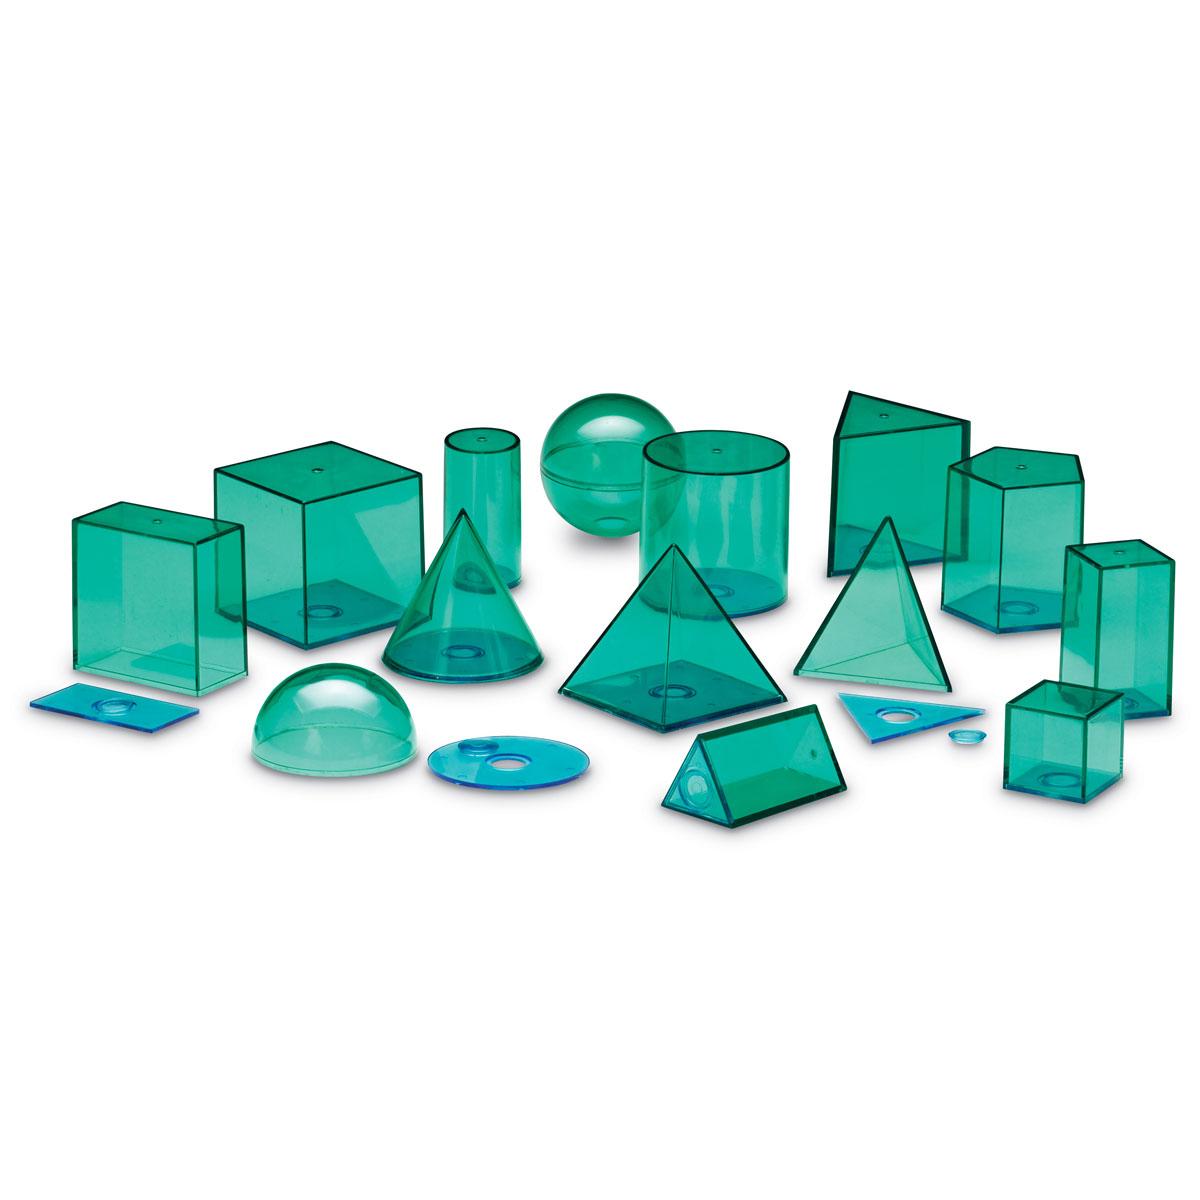 Buy School View-Thru Large Geometric Shapes Set - by